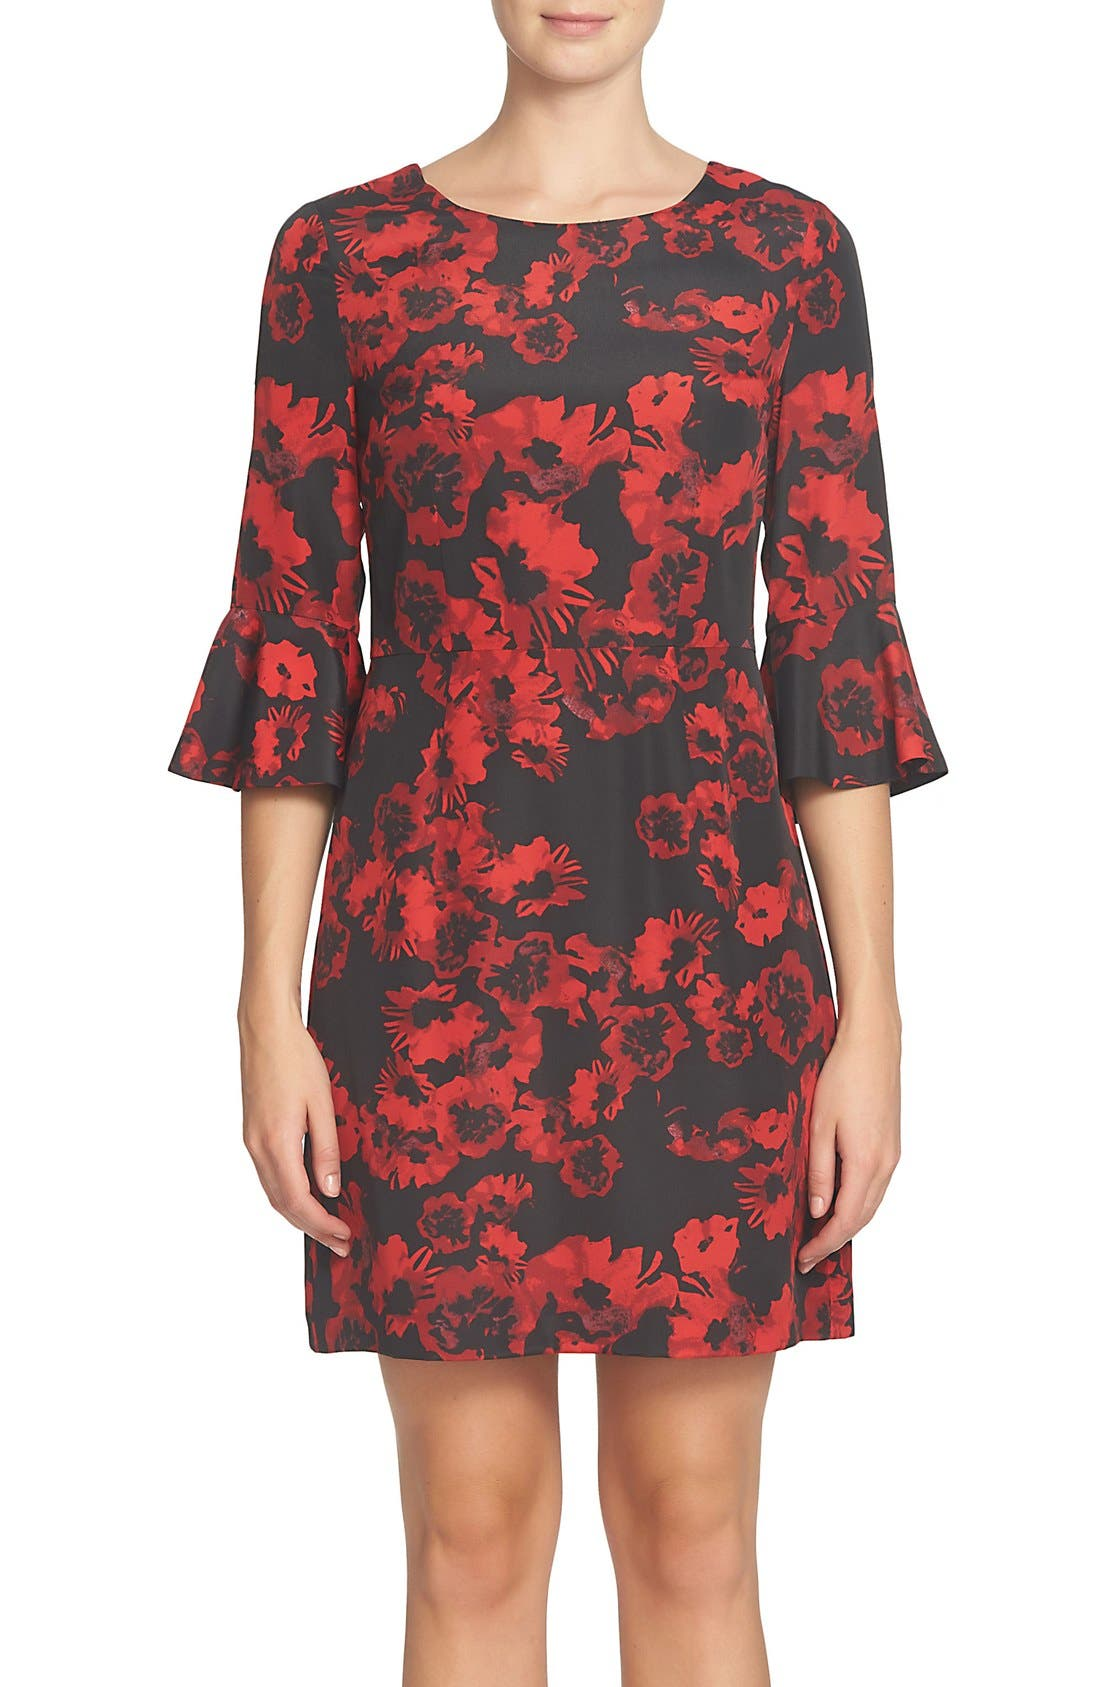 Alternate Image 1 Selected - Cynthia Steffe Ava Print Sheath Dress